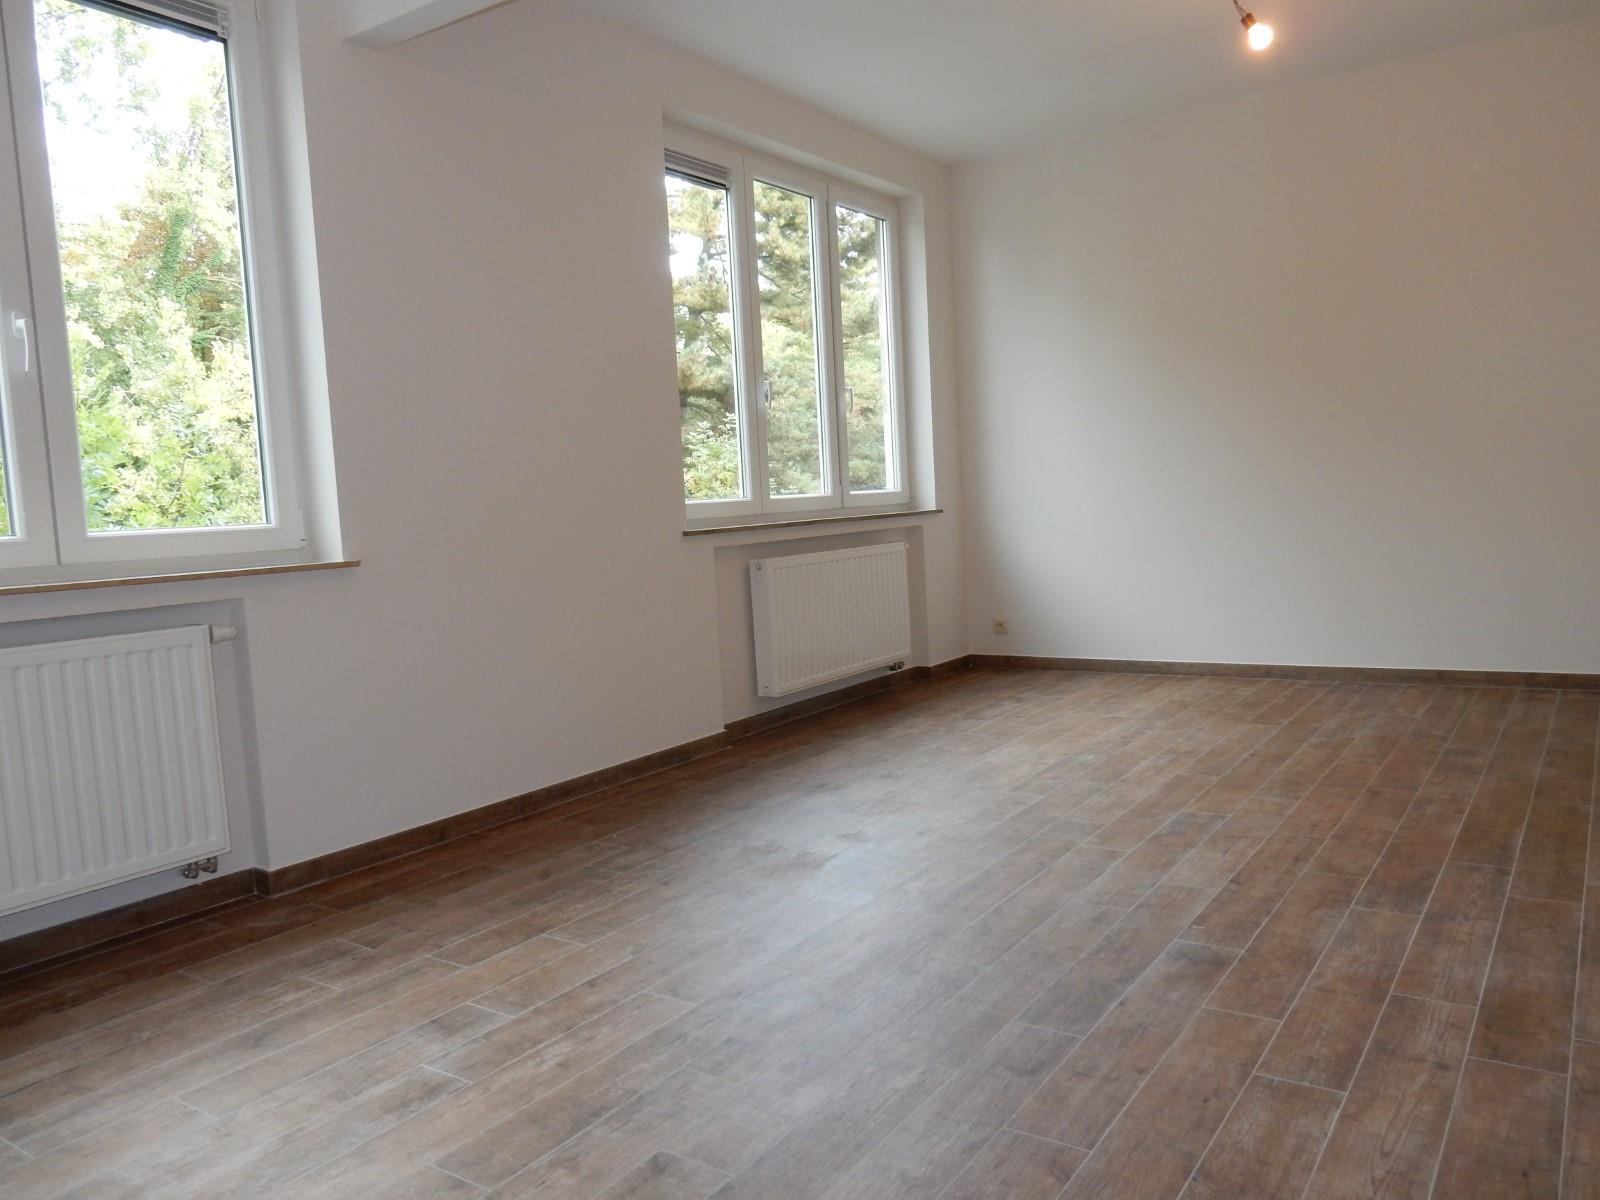 Appartement - Molenbeek-Saint-Jean - #3532282-2